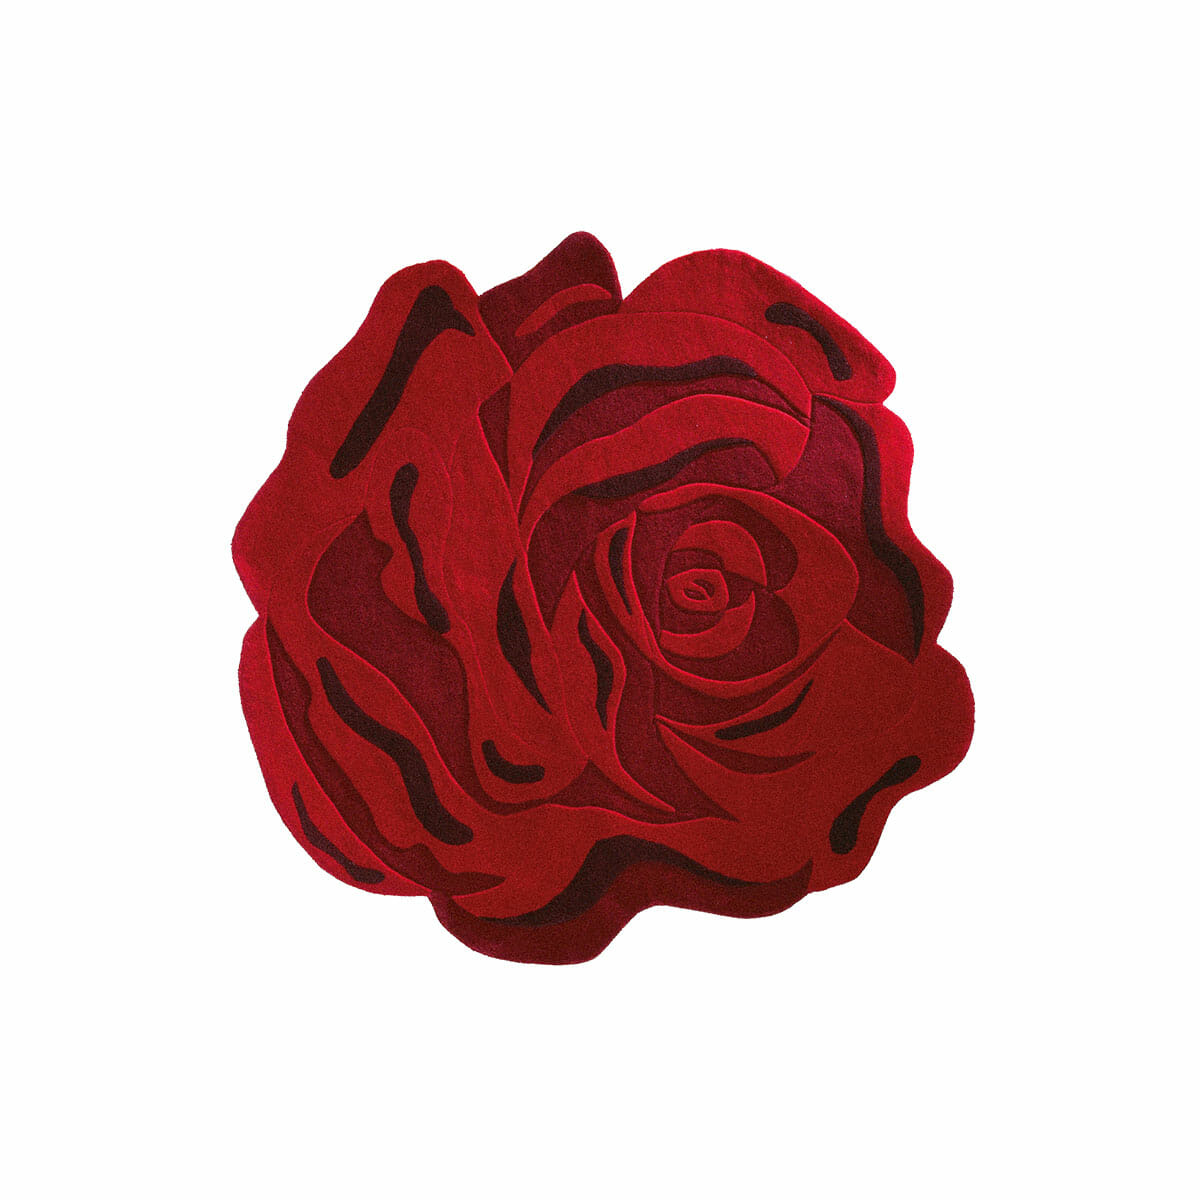 bretz teppich rosenbl te preis pro quadratmeter 248. Black Bedroom Furniture Sets. Home Design Ideas